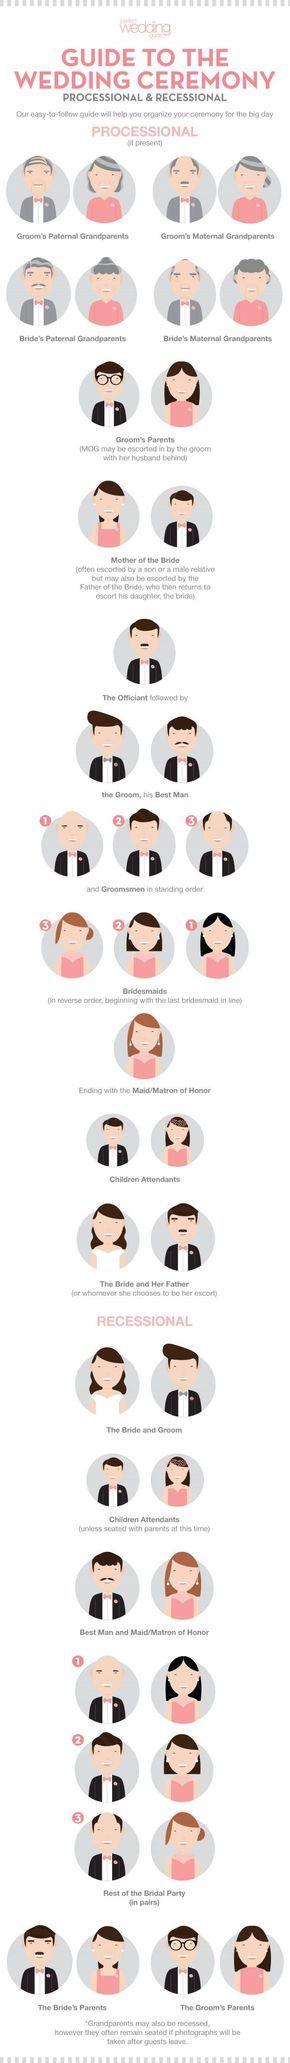 25+ best ideas about Wedding ceremony order on Pinterest   Groom ...